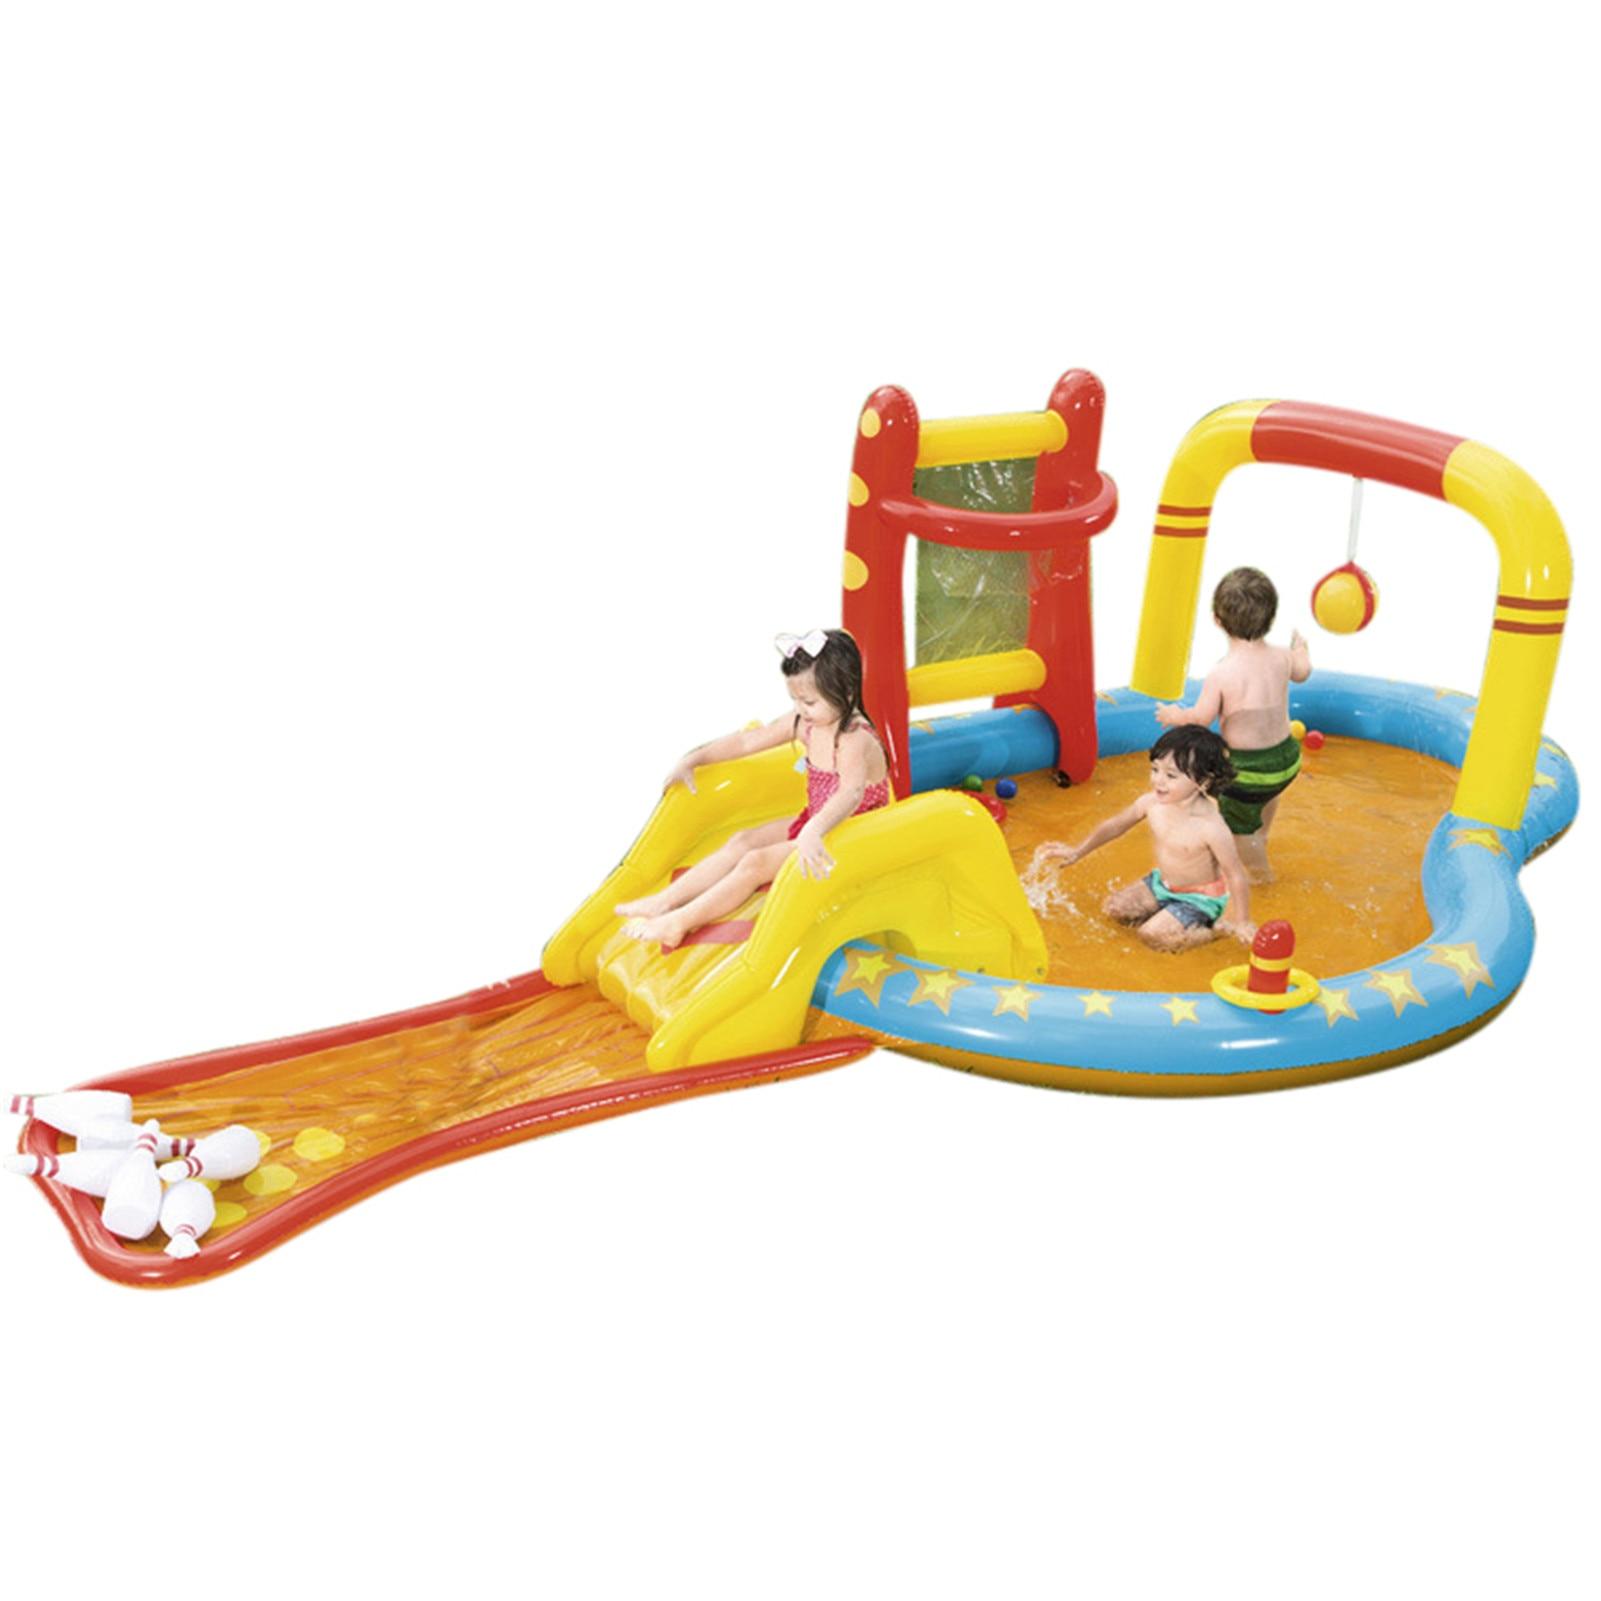 Inflatable Paddling Pool Square Kids Children's Home Use Paddling Pool Portable Foldable Children Baby Bathing Tub